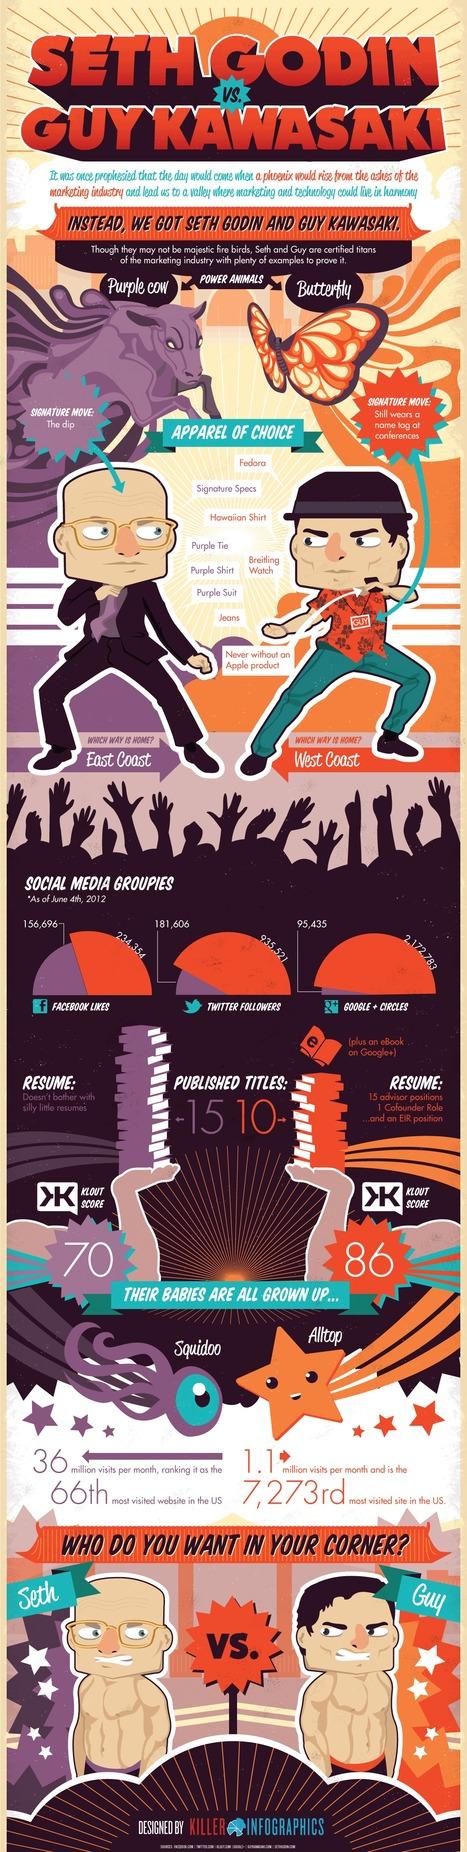 Seth Godin vs. Guy Kawasaki | Beyond Marketing | Scoop.it